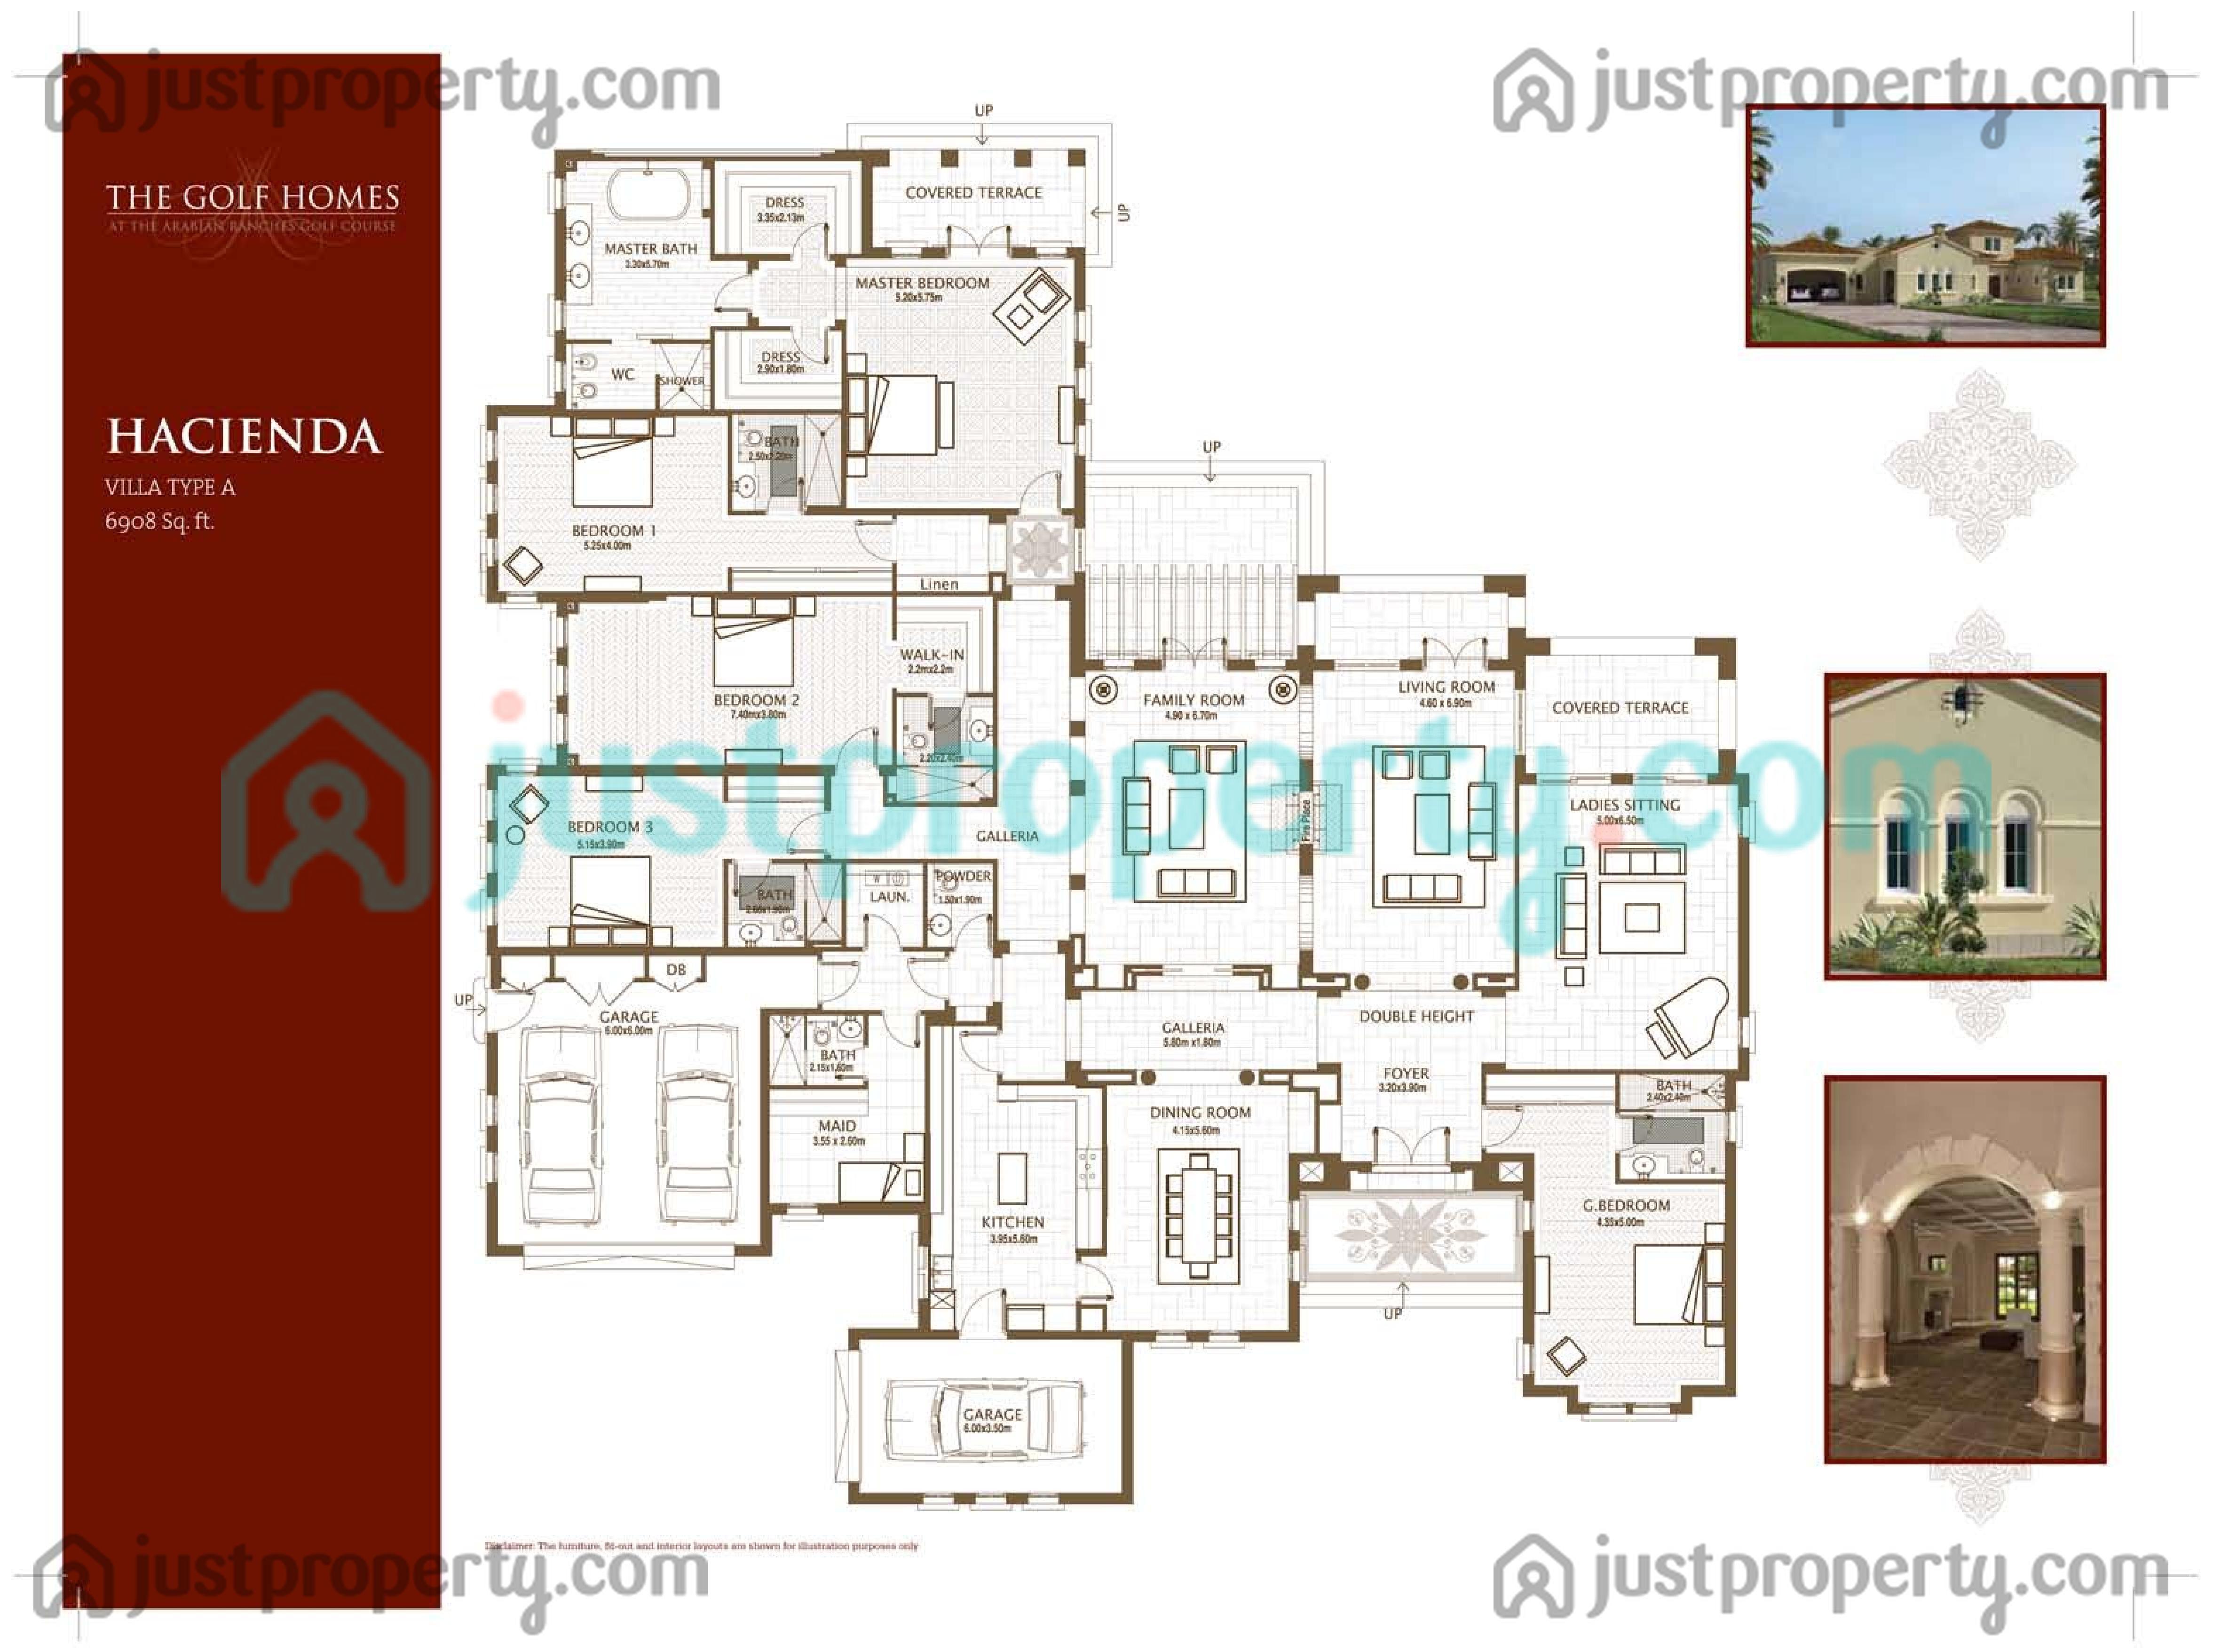 The Golf Homes Floor Plans Justproperty Com Floor Plans Garage Workshop Layout Floor Plan Design